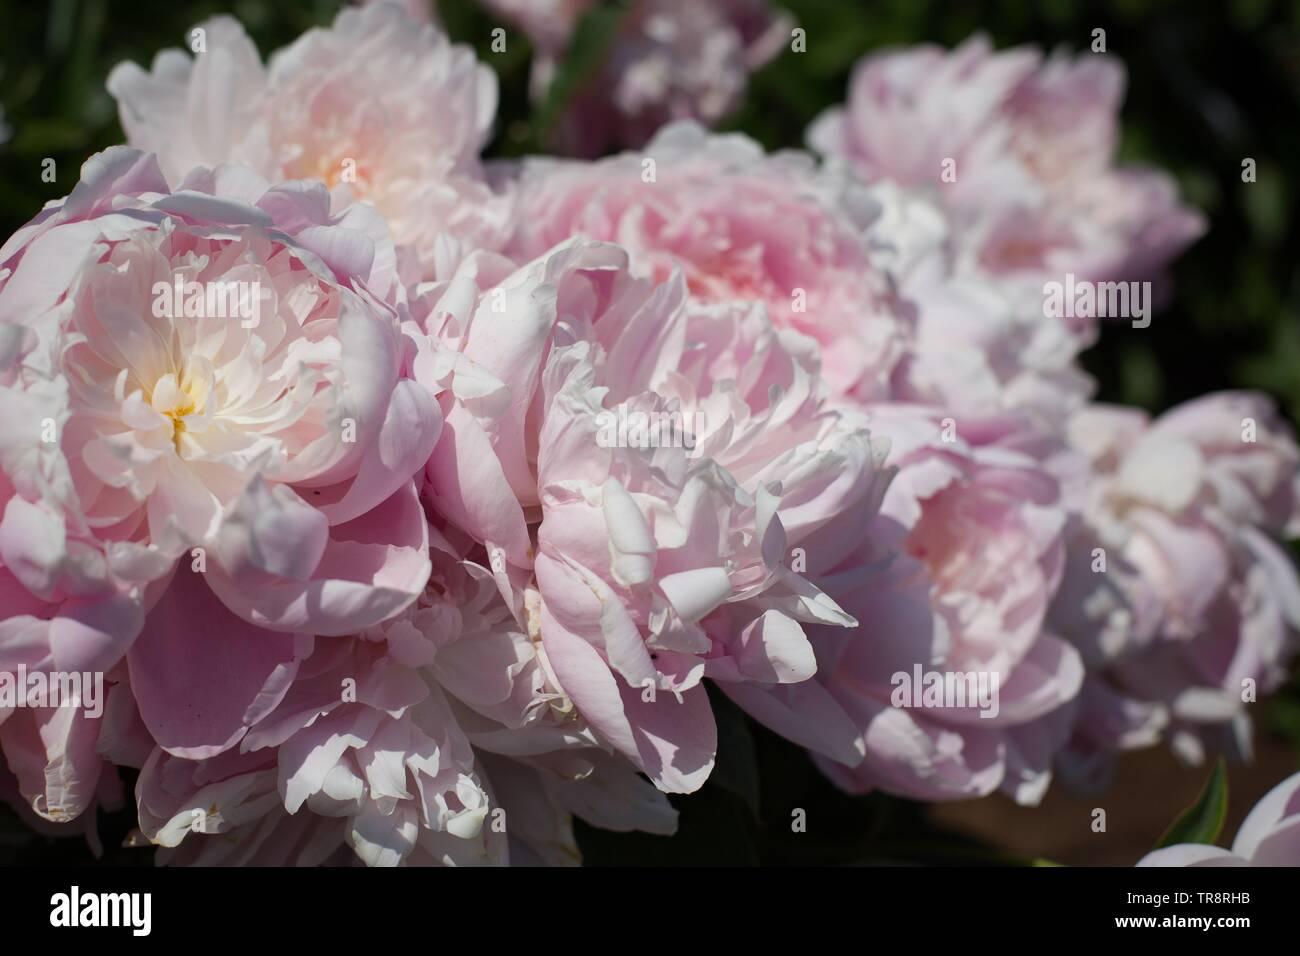 Peonia Sig.ra FDR a Adelman Peonia Giardini in Salem, Oregon, Stati Uniti d'America. Immagini Stock